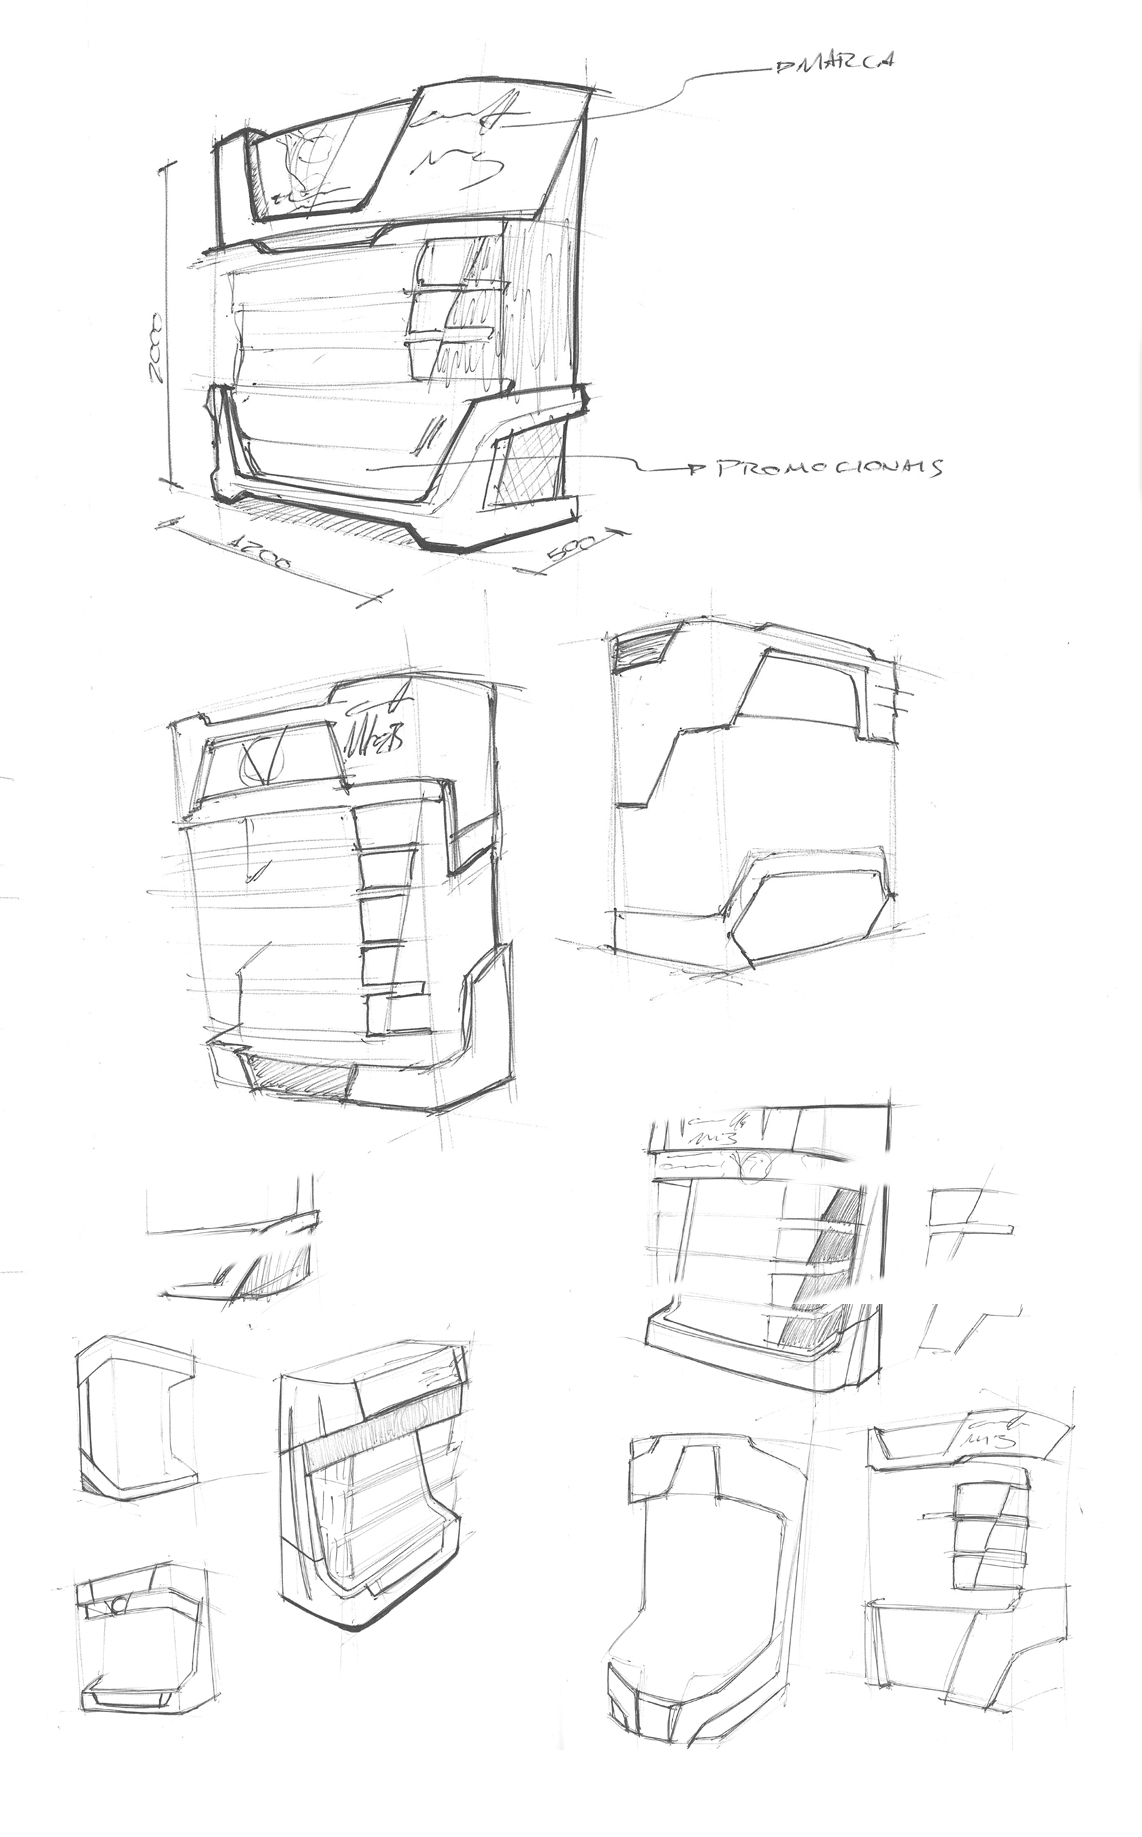 Gillette Mach3 by Henrique Xavier at Coroflot.com